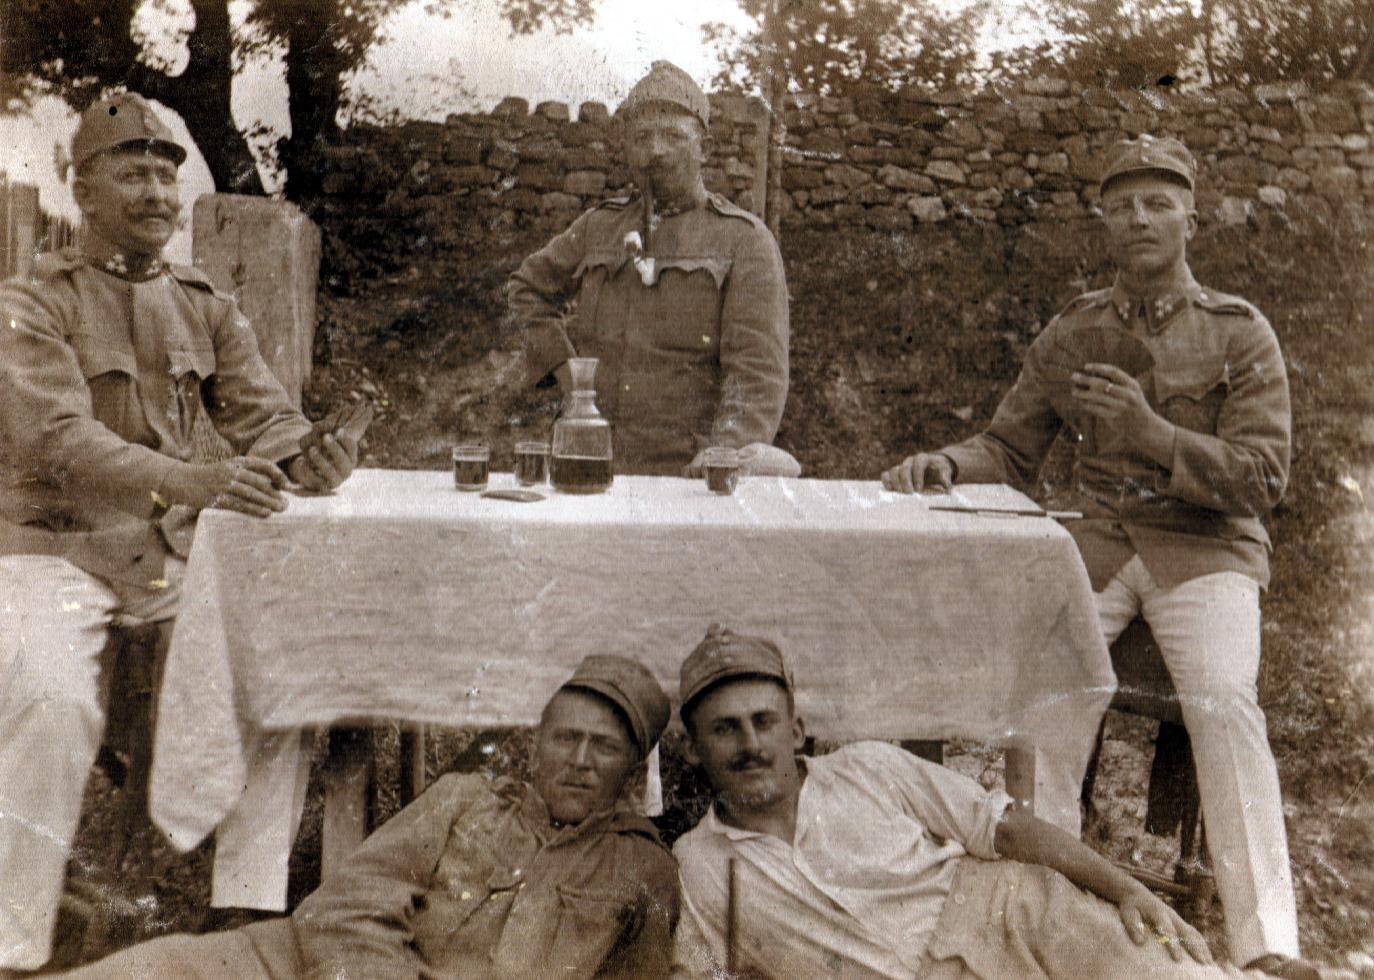 Ilona Seifert's uncle Oszkar Wollner as a soldier